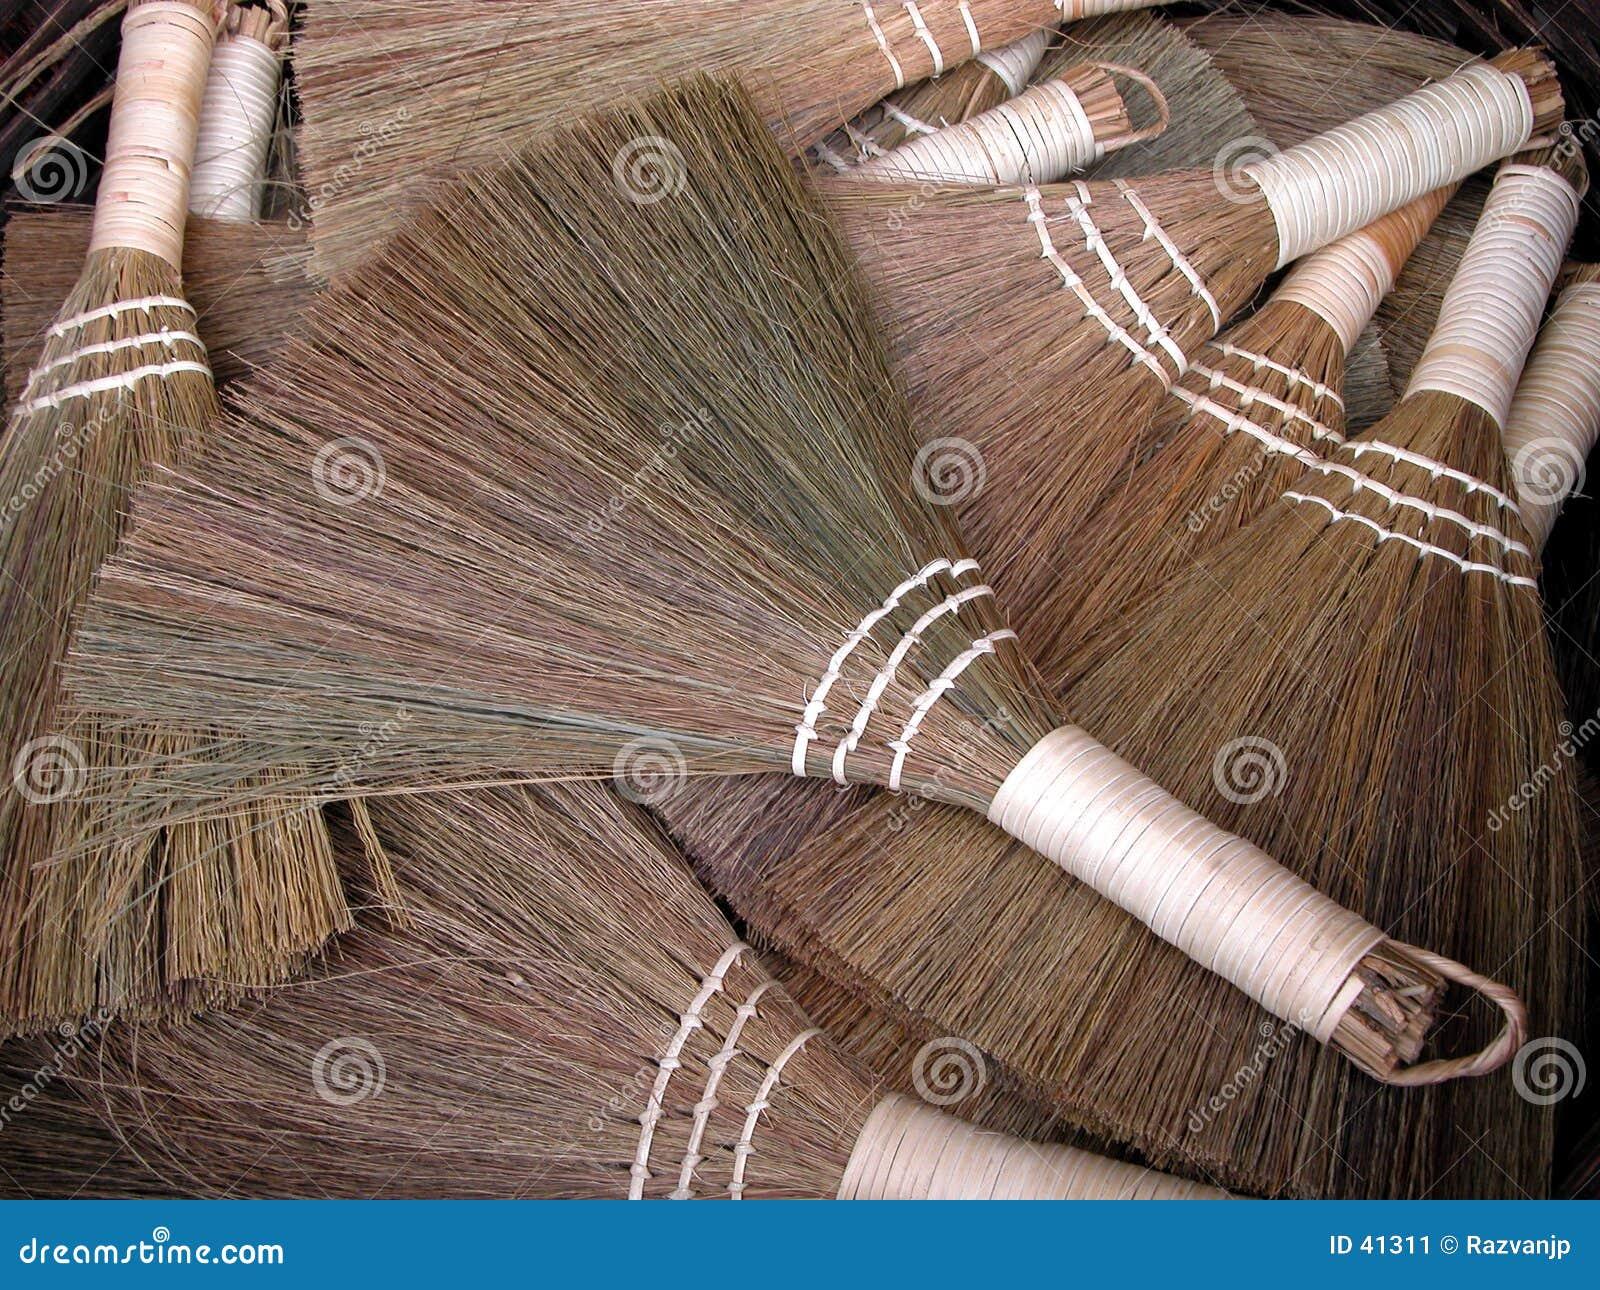 Little brooms